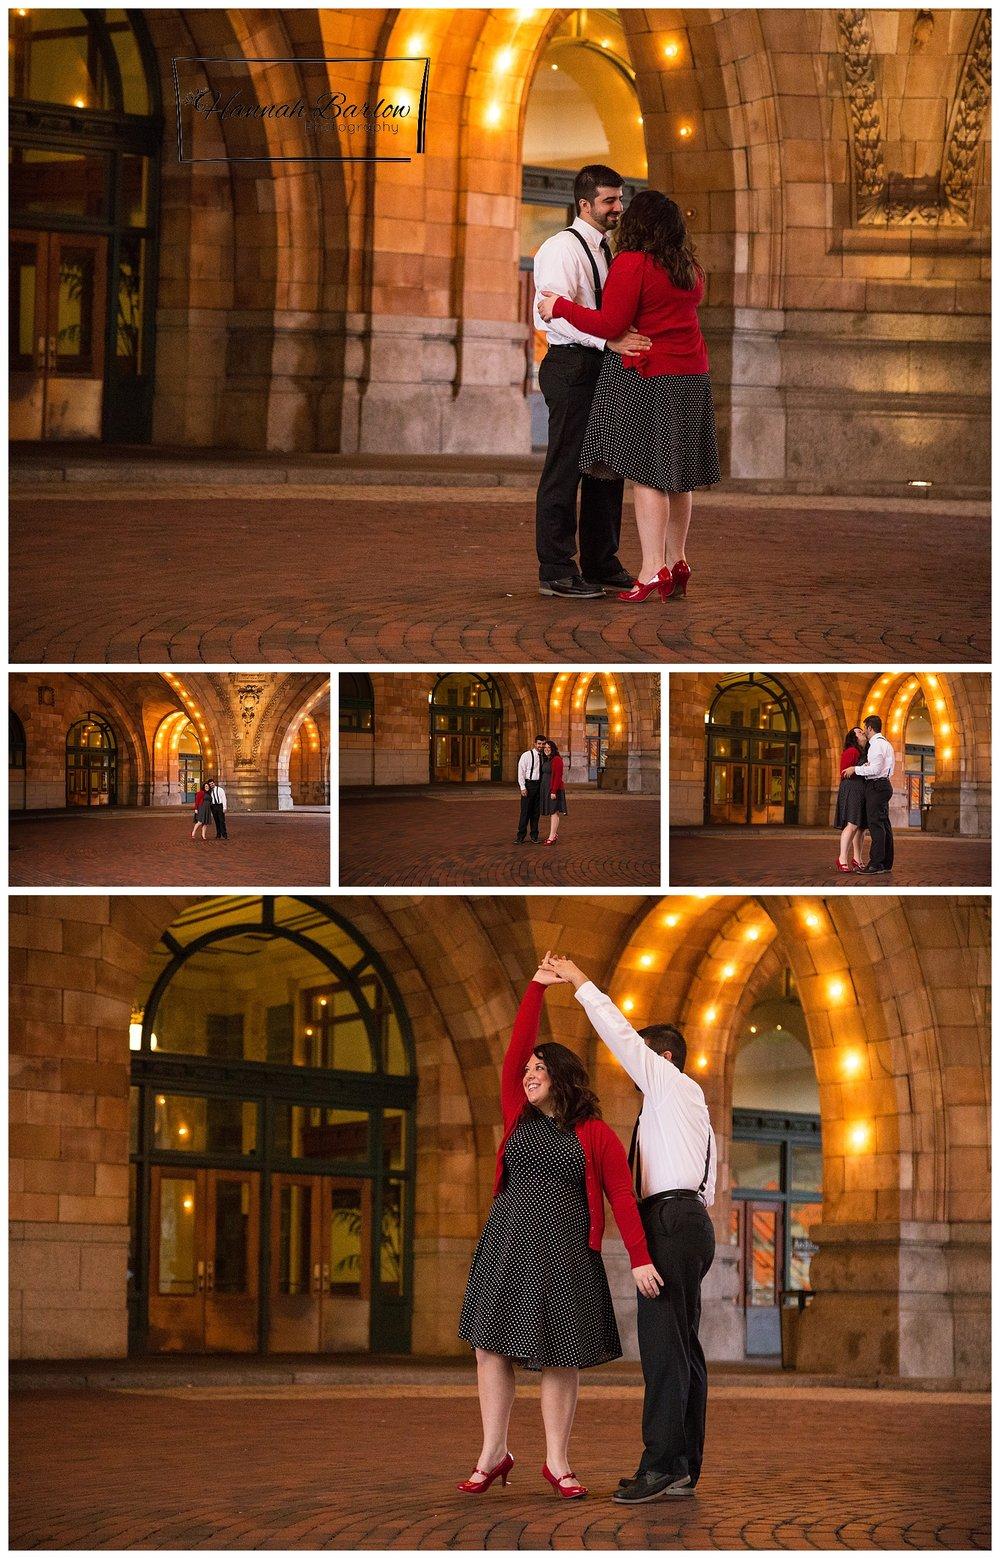 Penn Station Engagement Photos Pittsburgh, PA